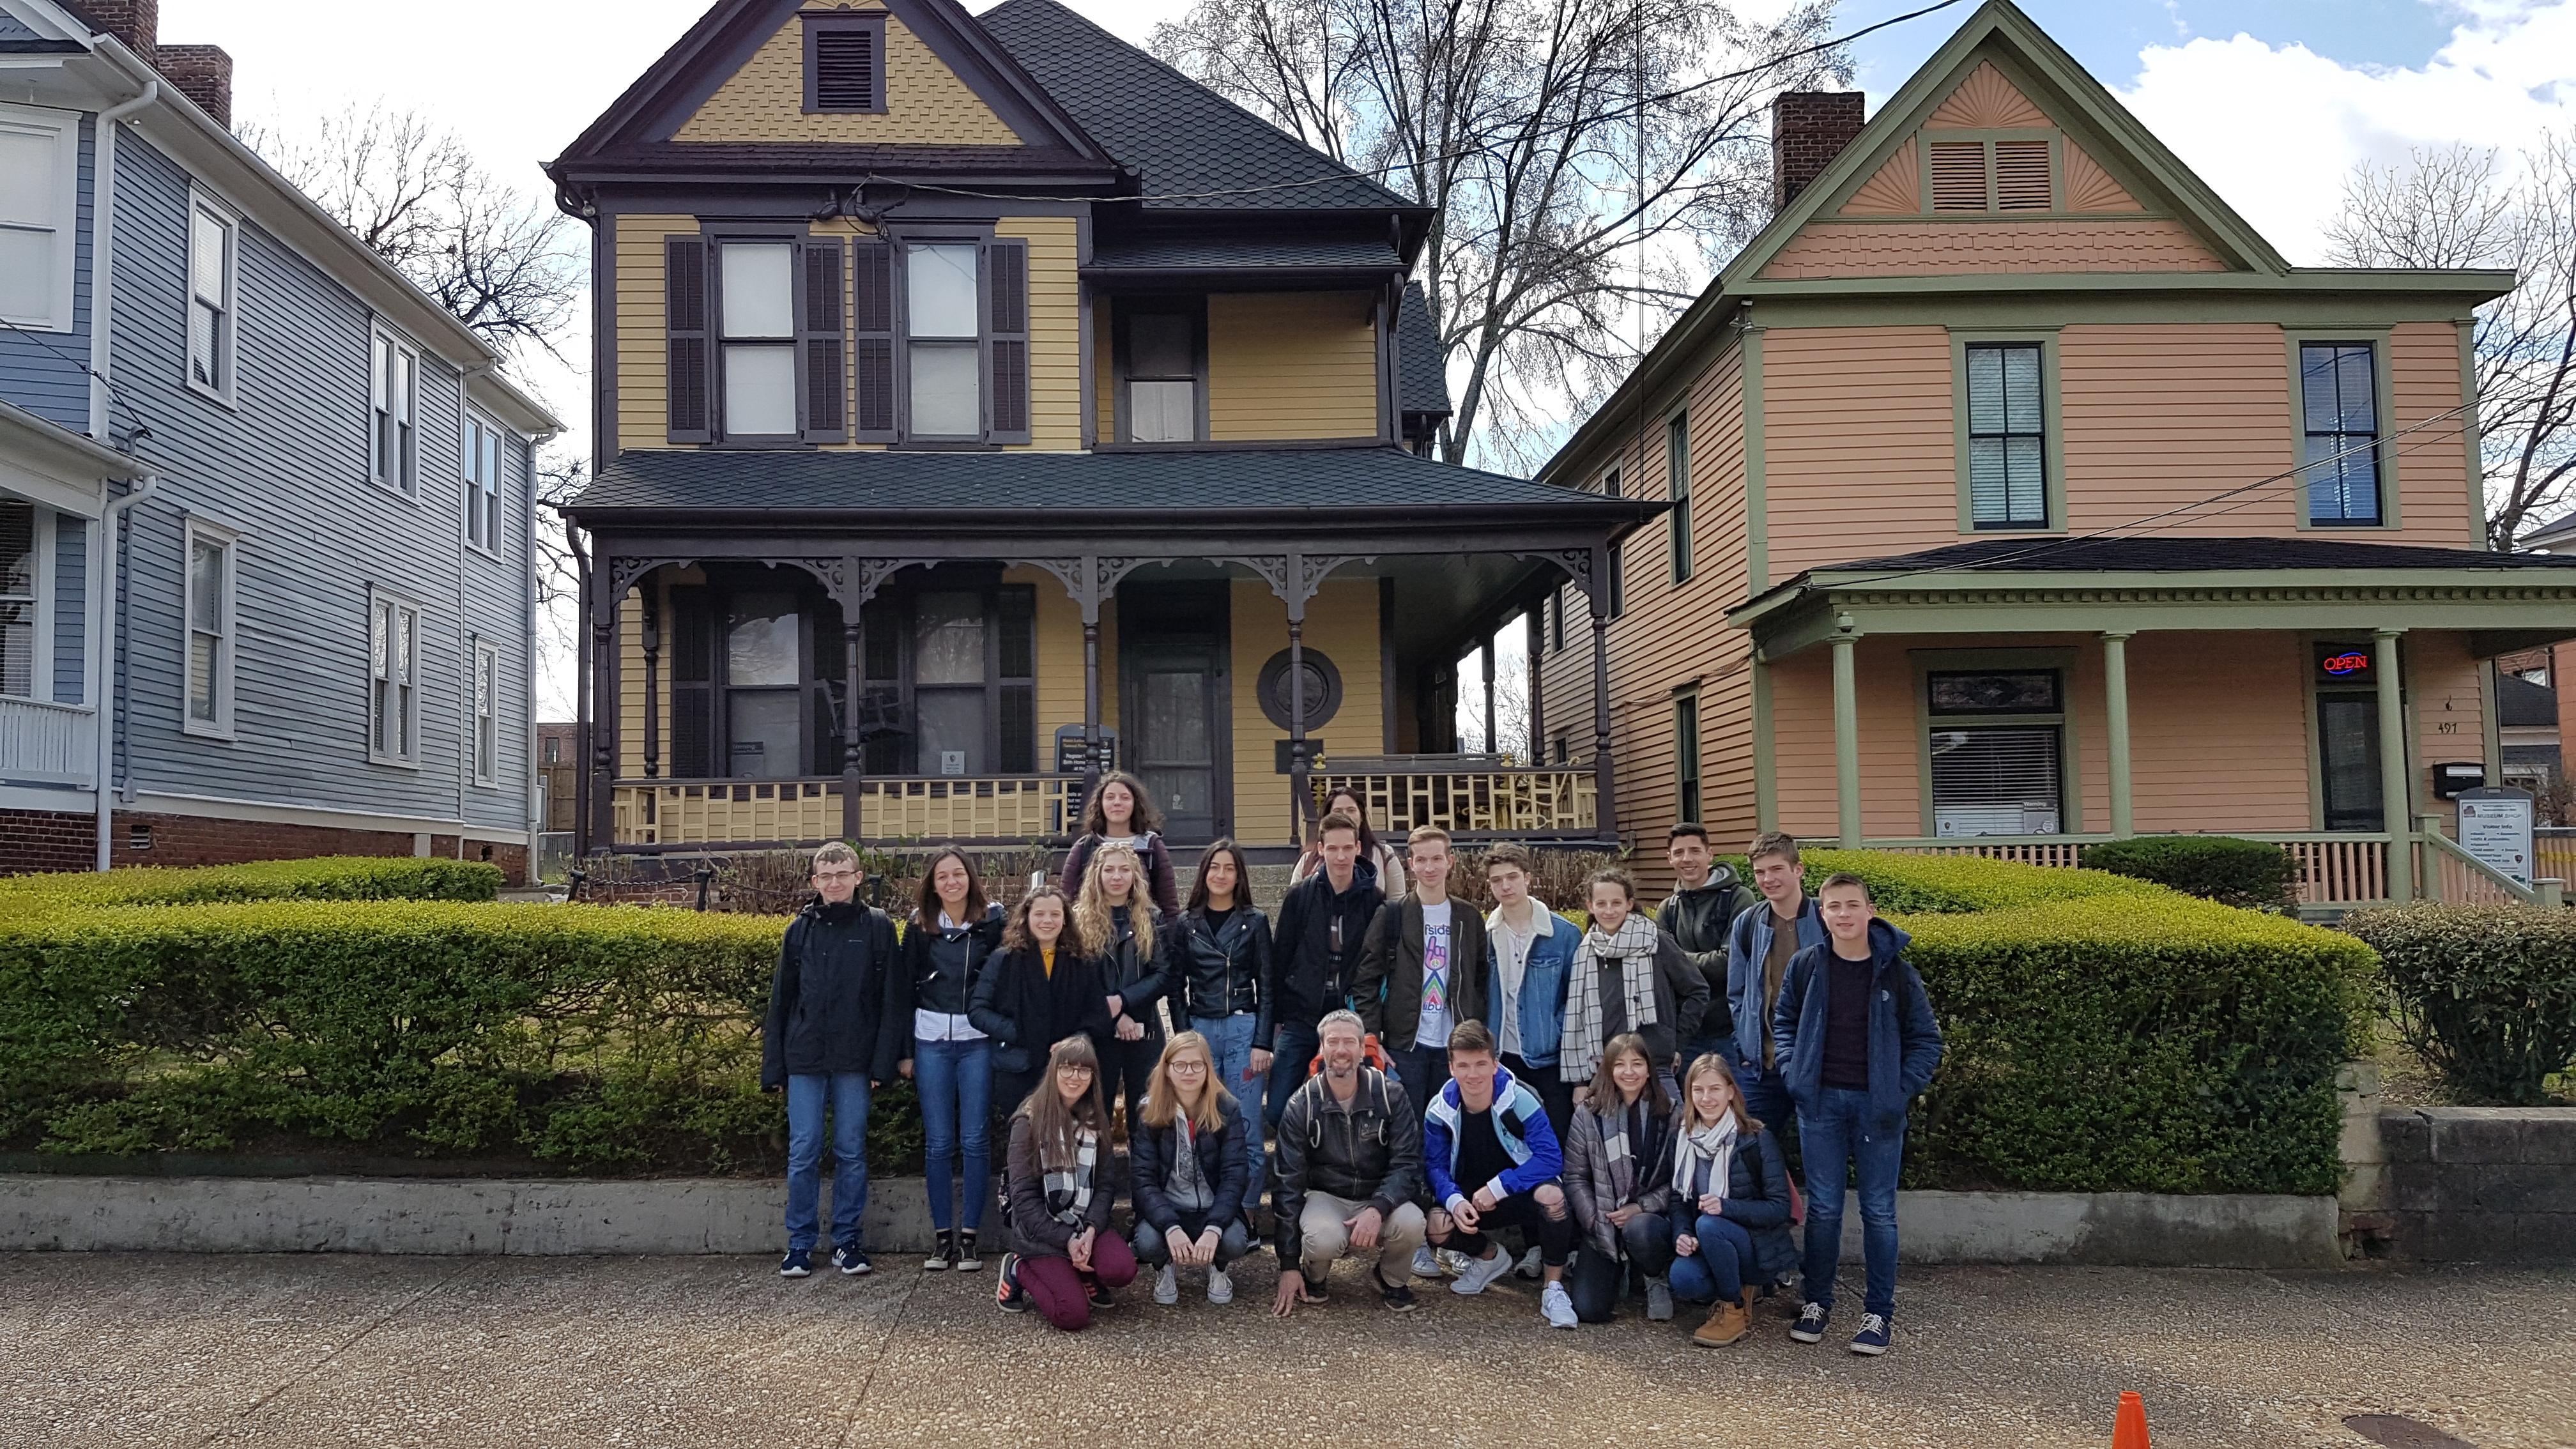 Maison natale de Martin Luther king1